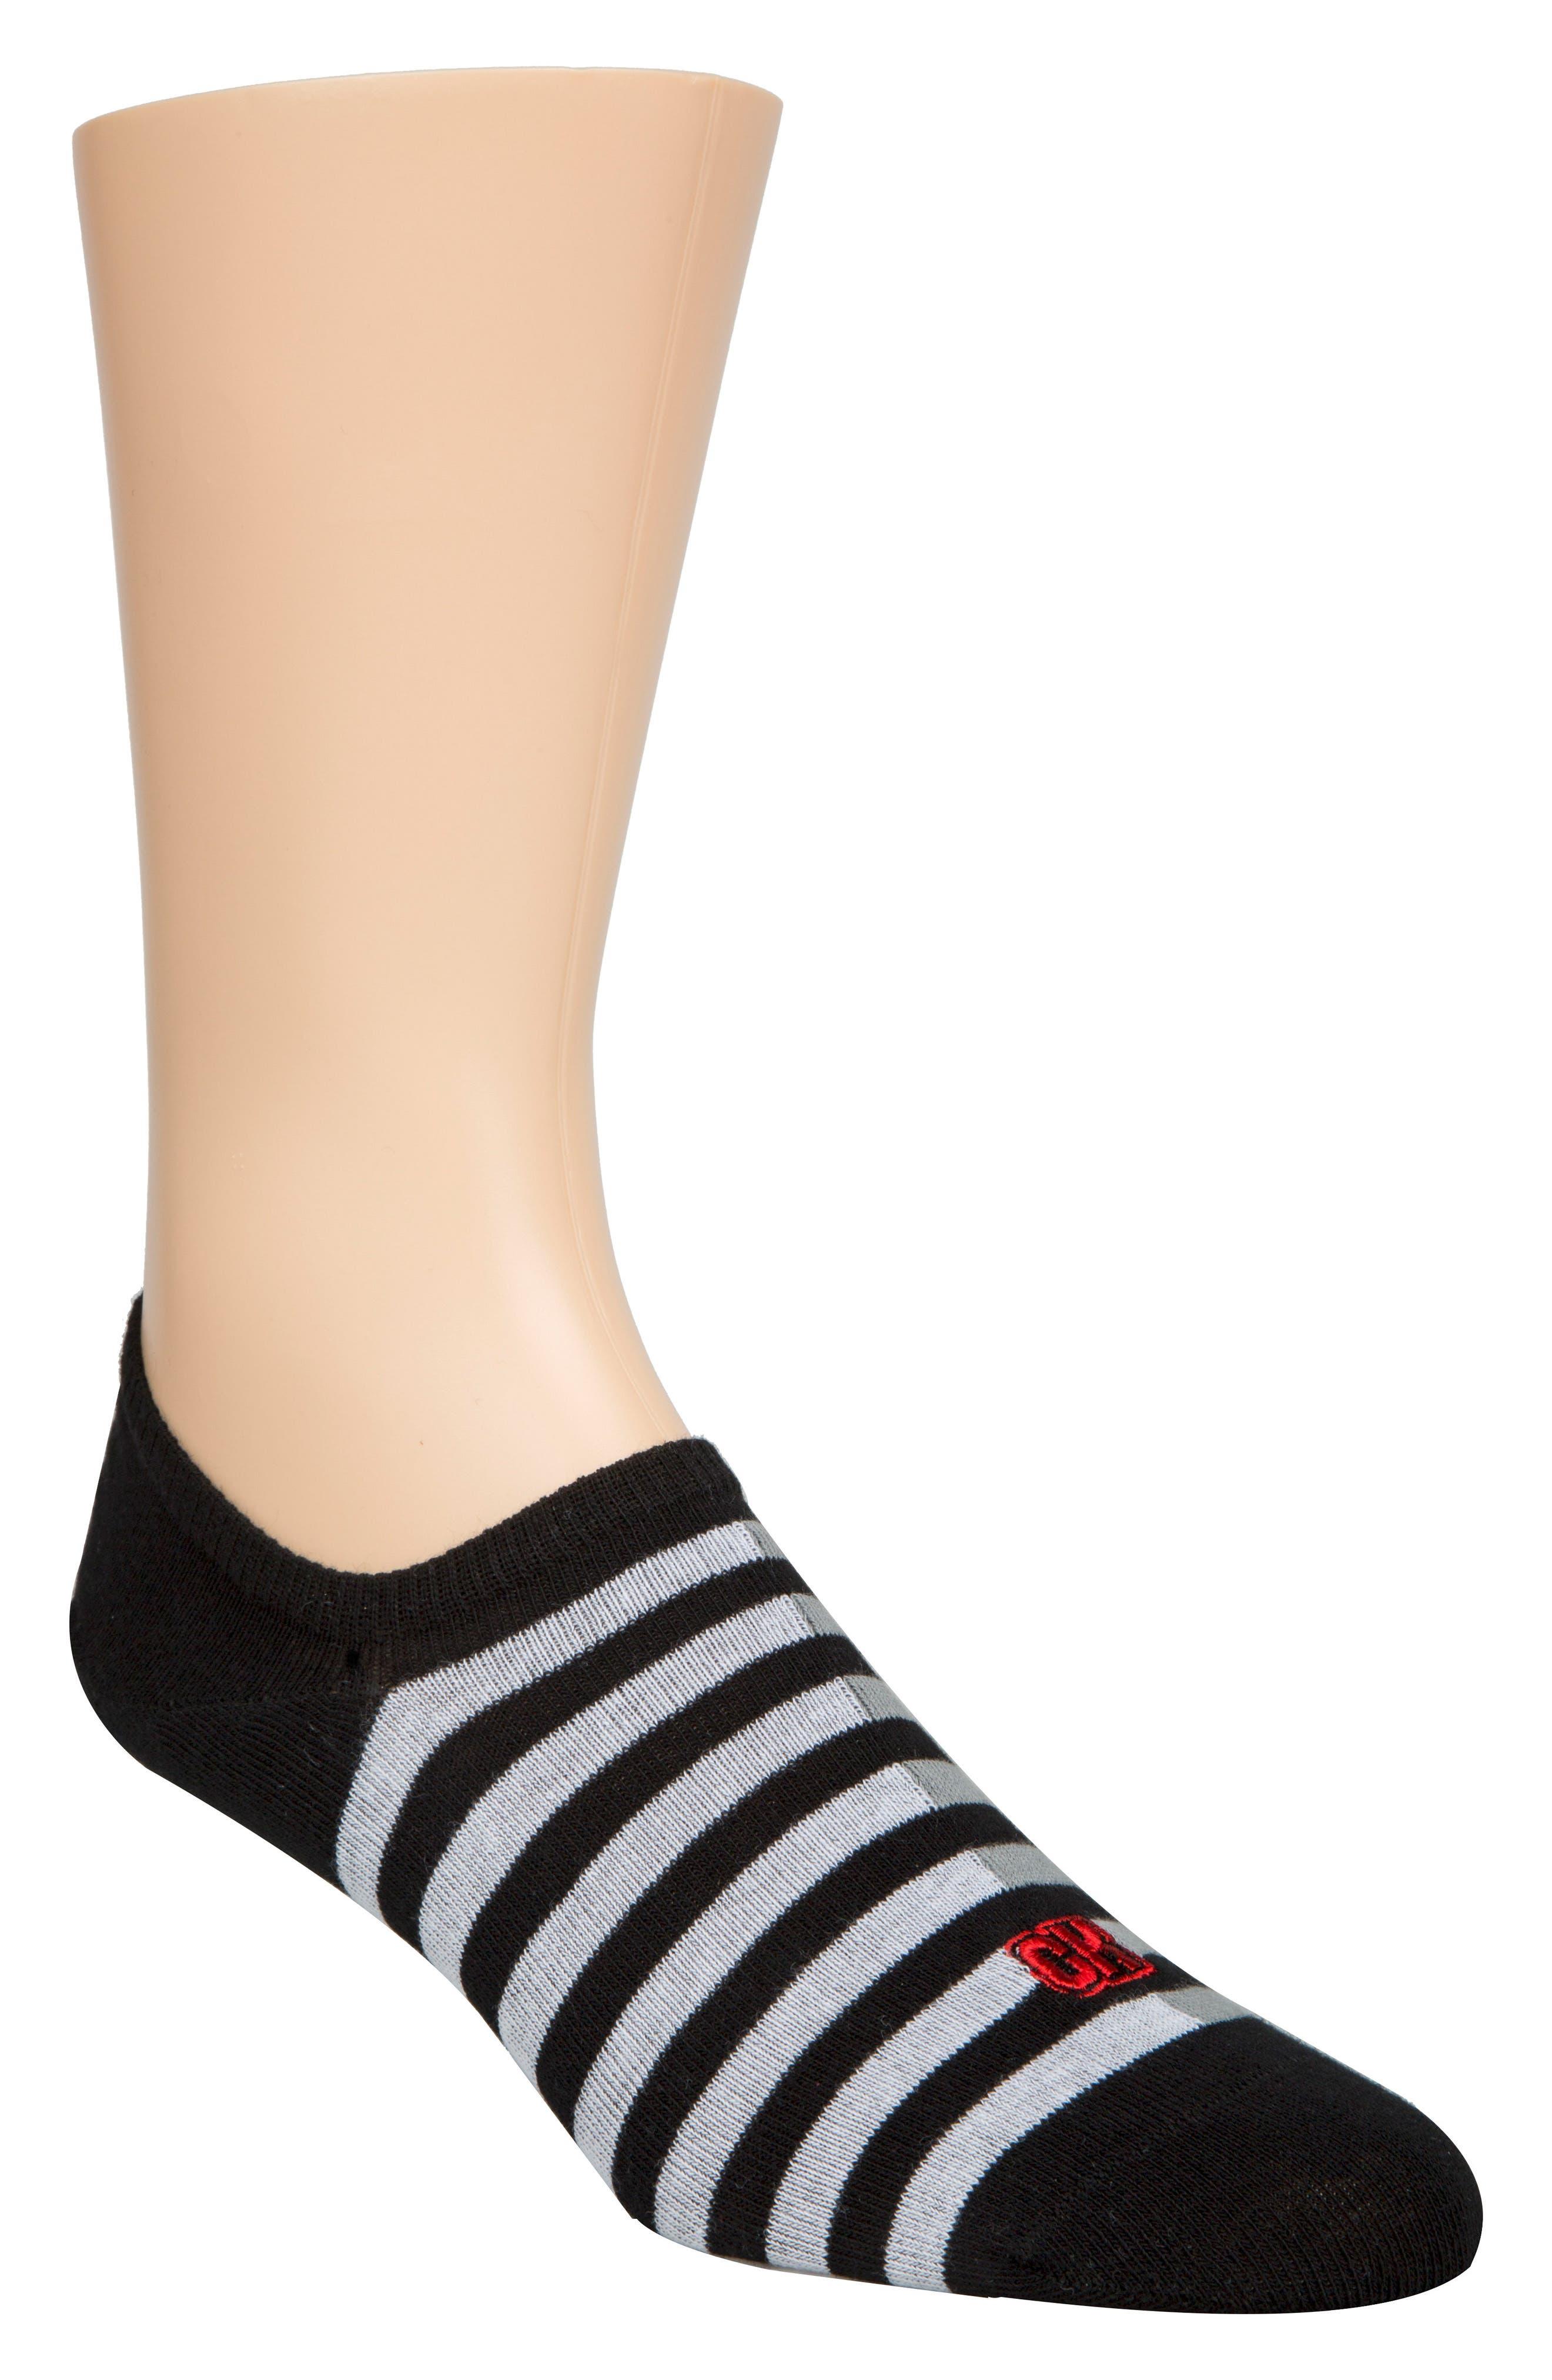 CALVIN KLEIN Stripe No-Show Socks, Main, color, 001